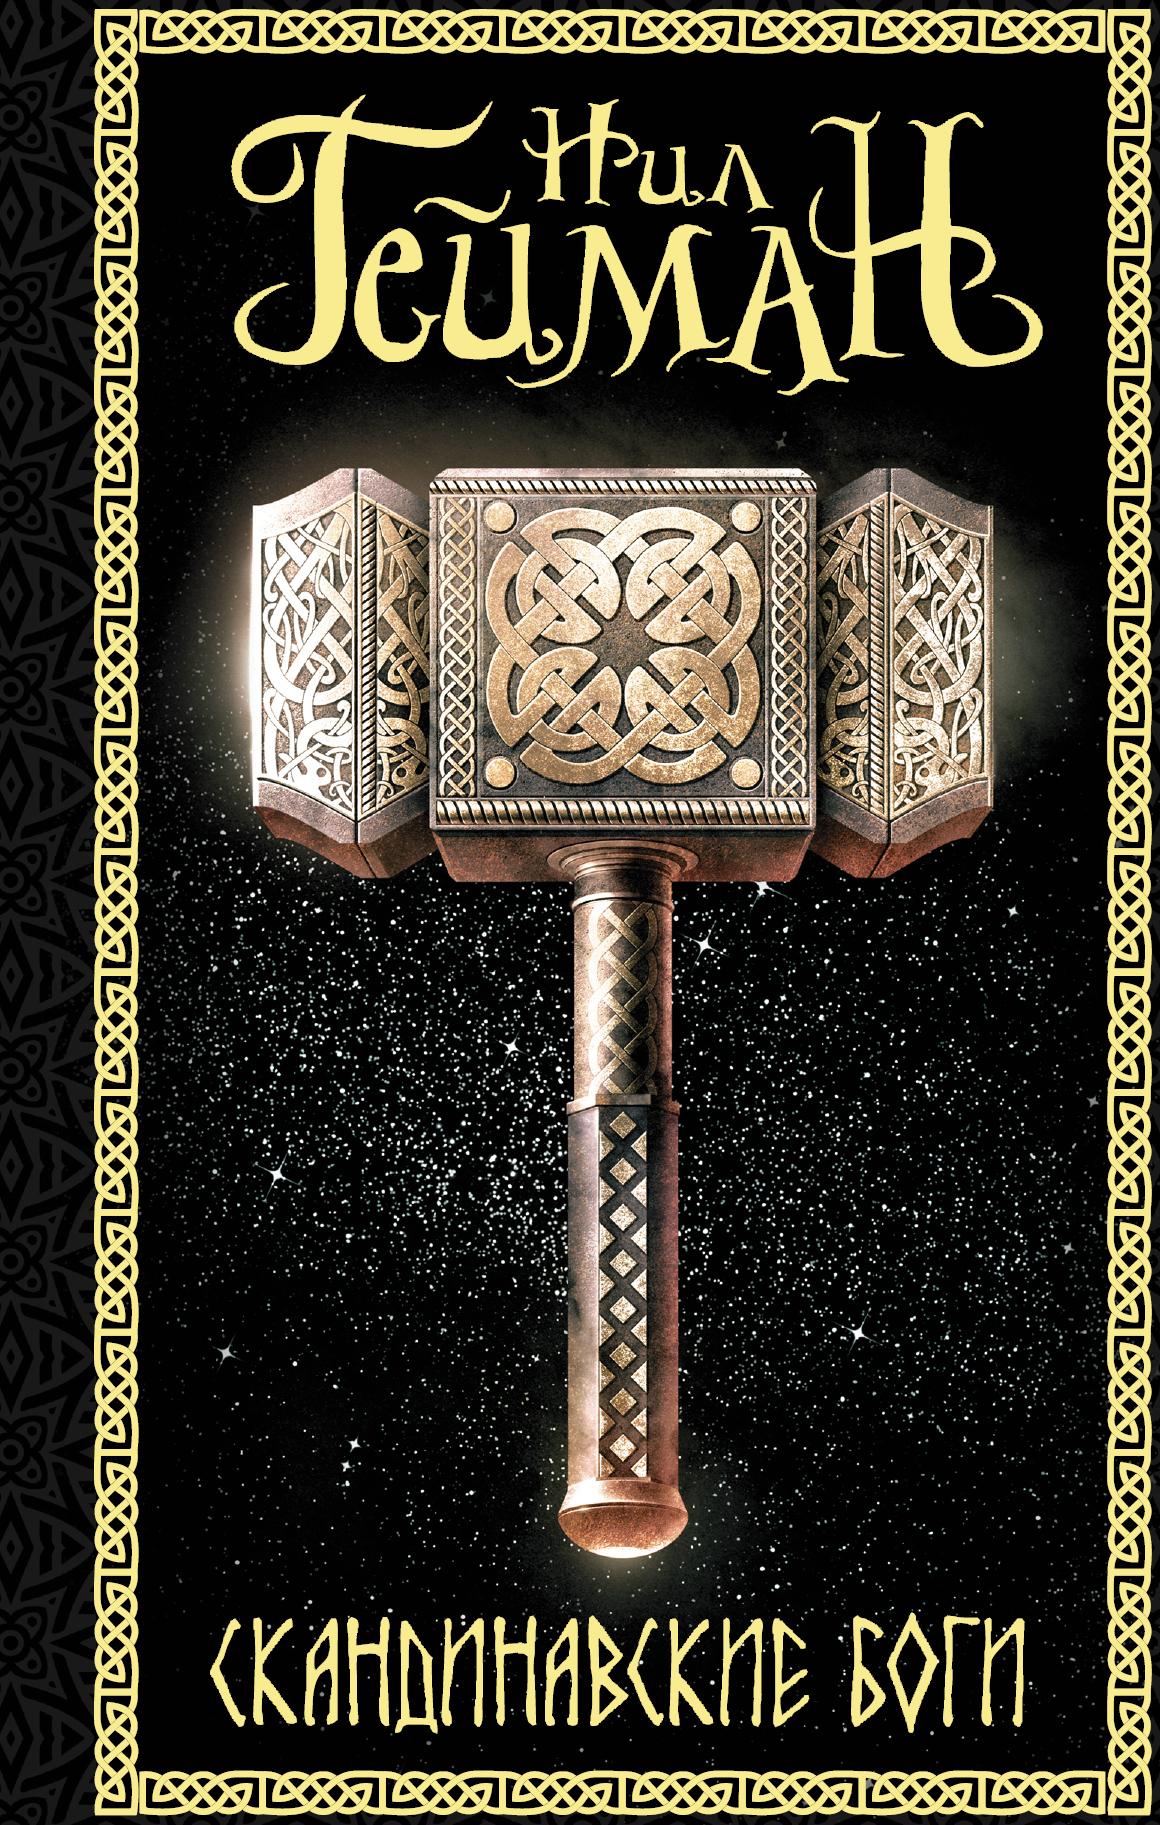 Нил Гейман Скандинавские боги гейман н скандинавские боги